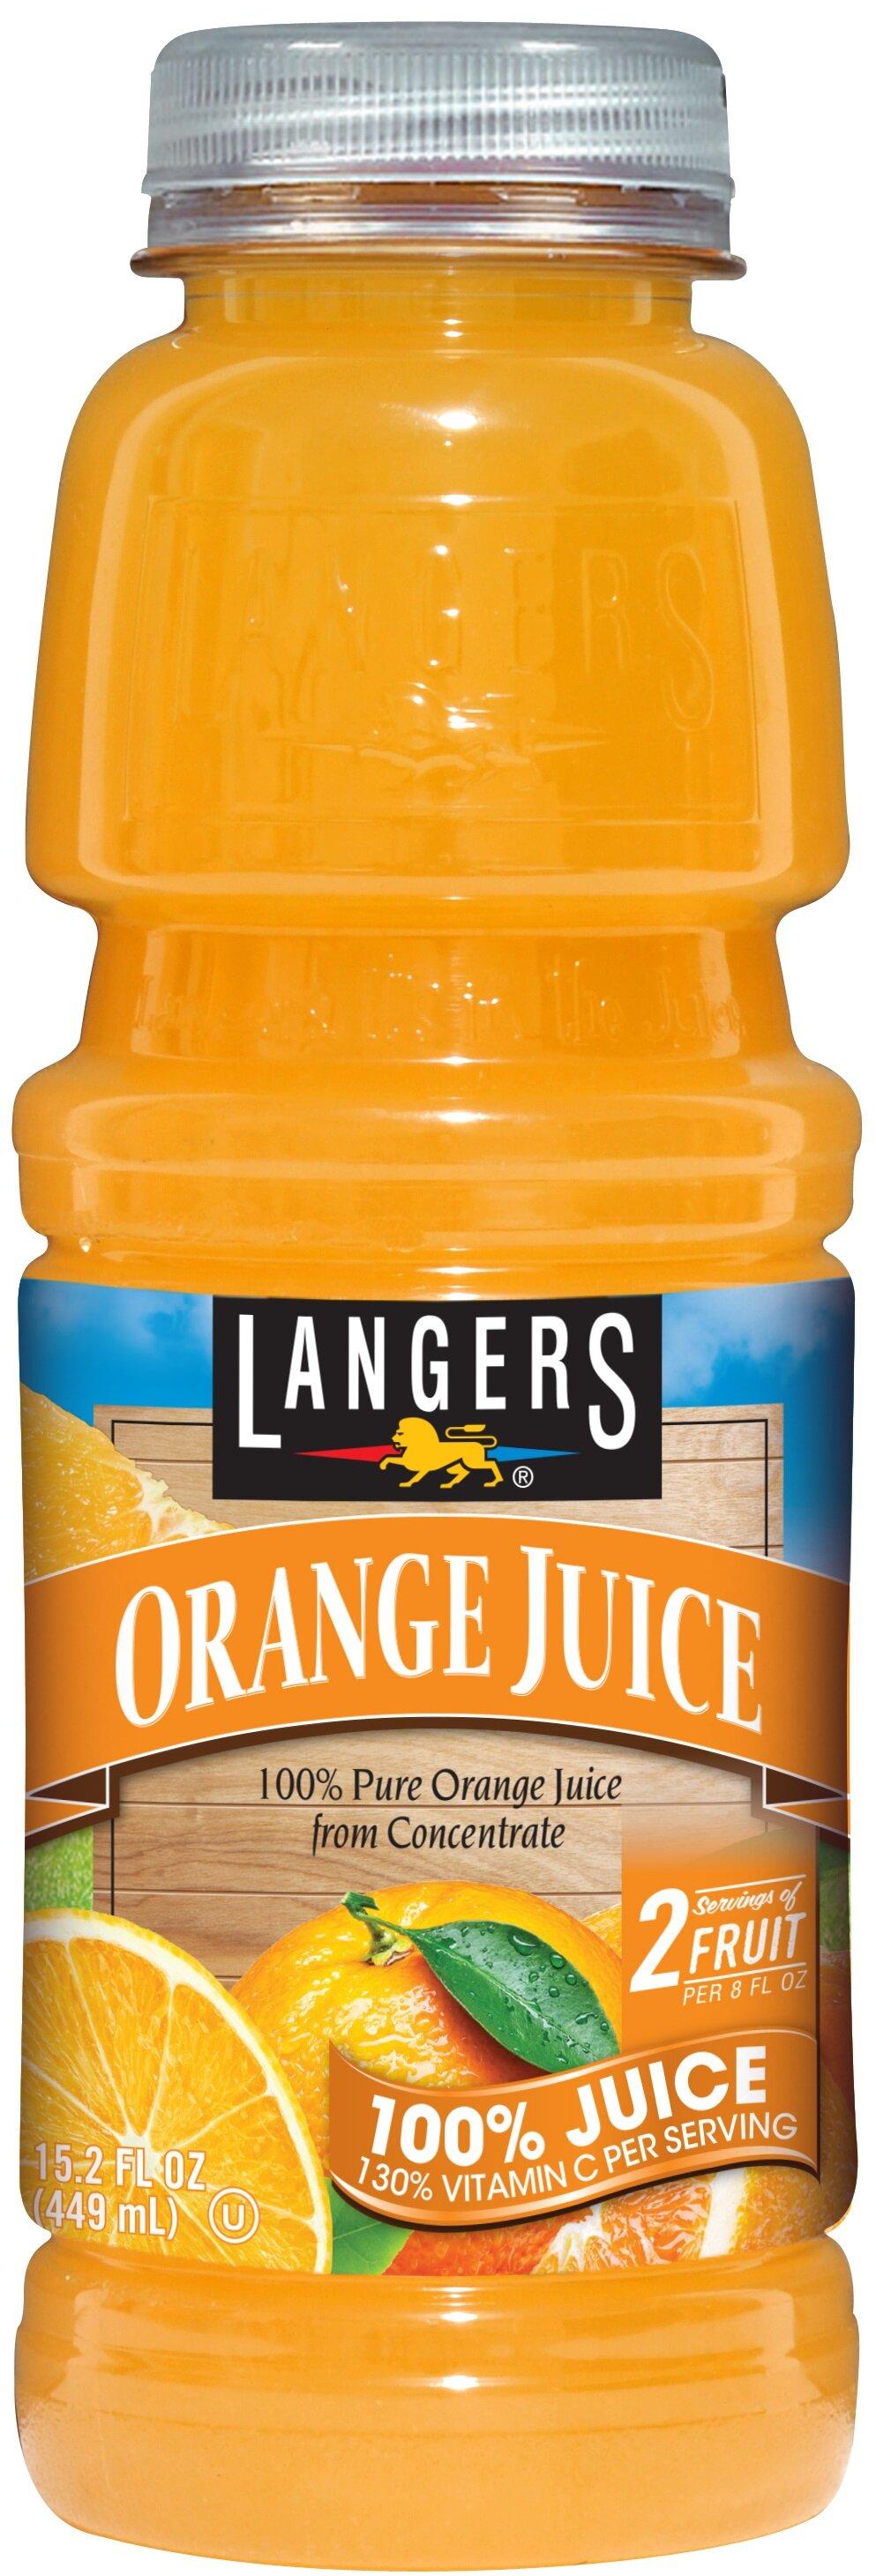 Langers 15oz PET 100% Orange Juice.jpg